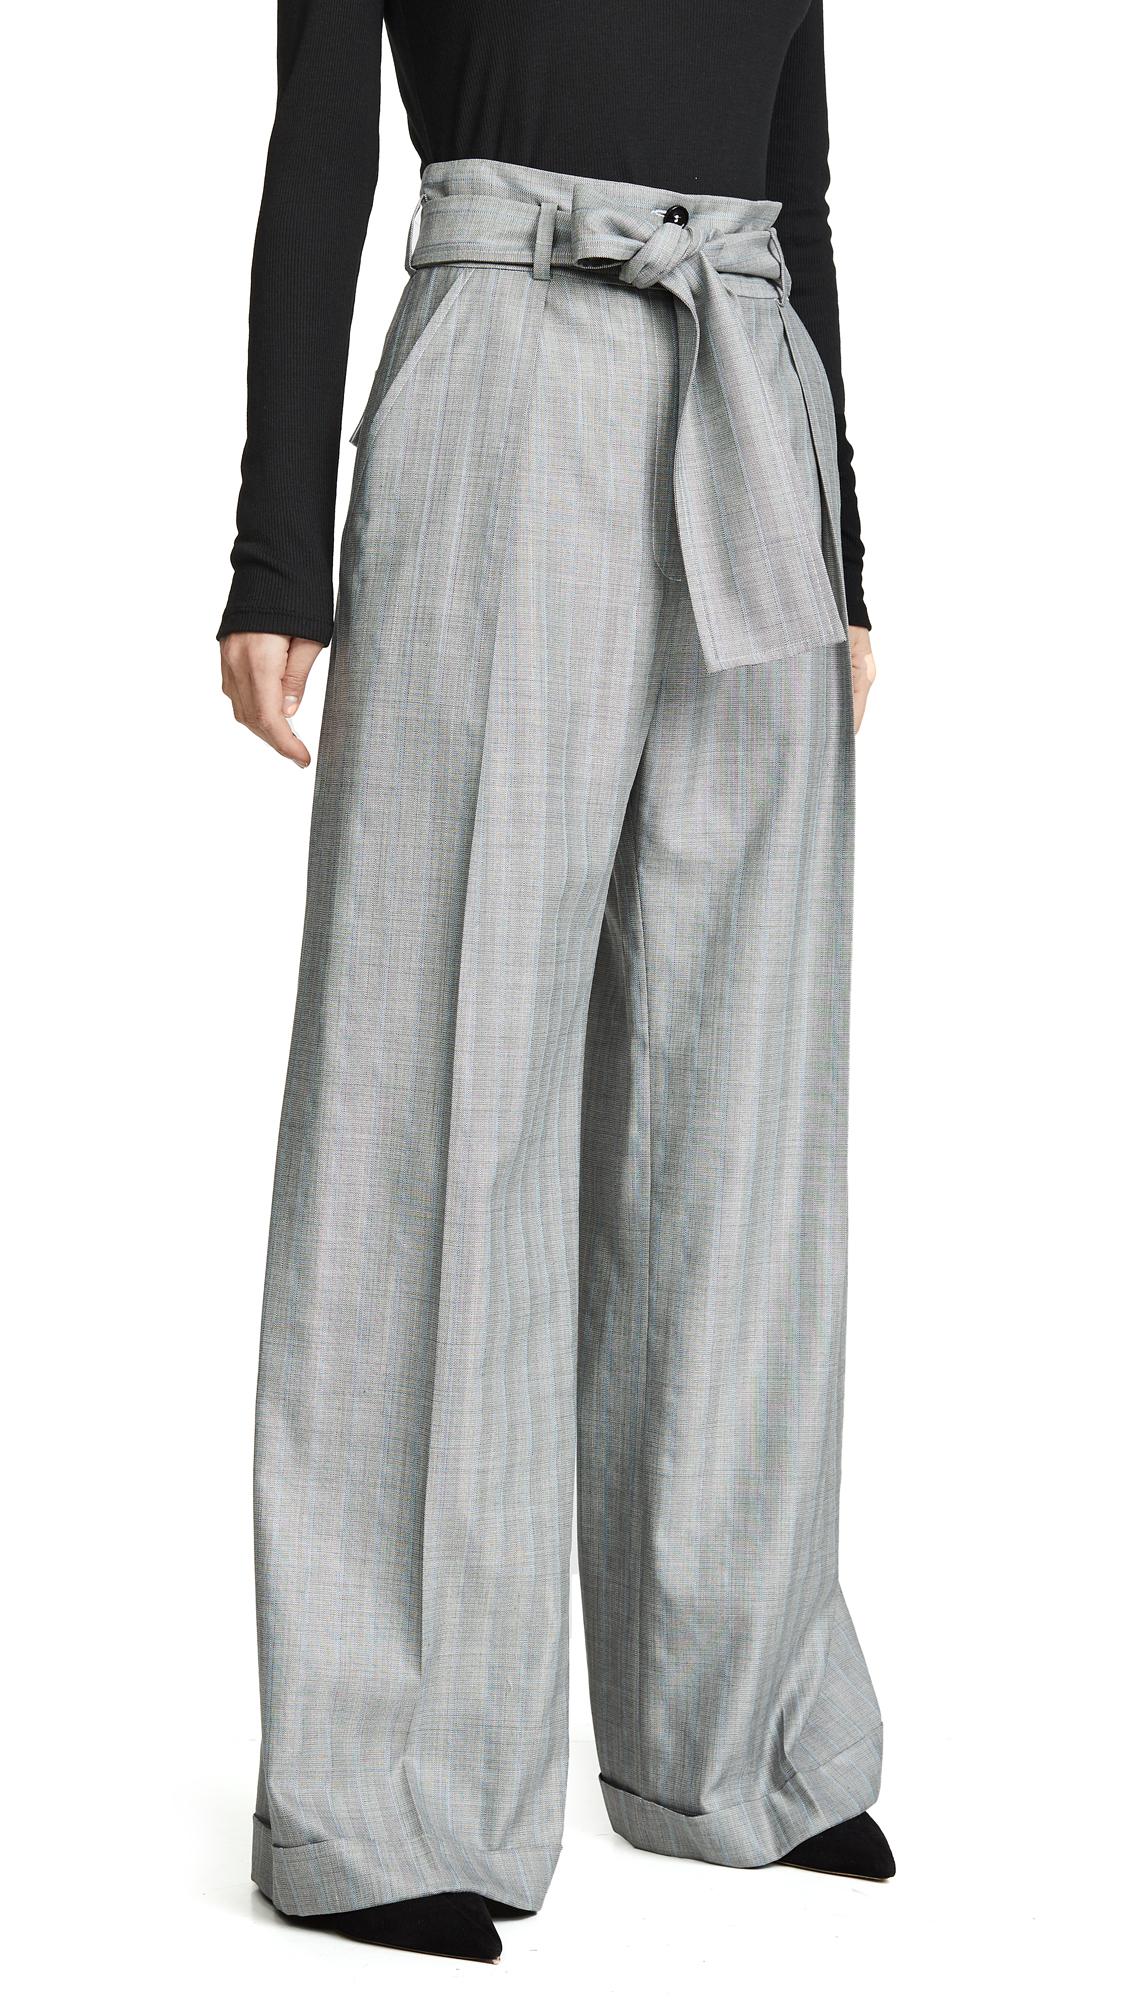 Nina Ricci Tie Waist Pinstripe Pants - Grey/Blue Pinstripe